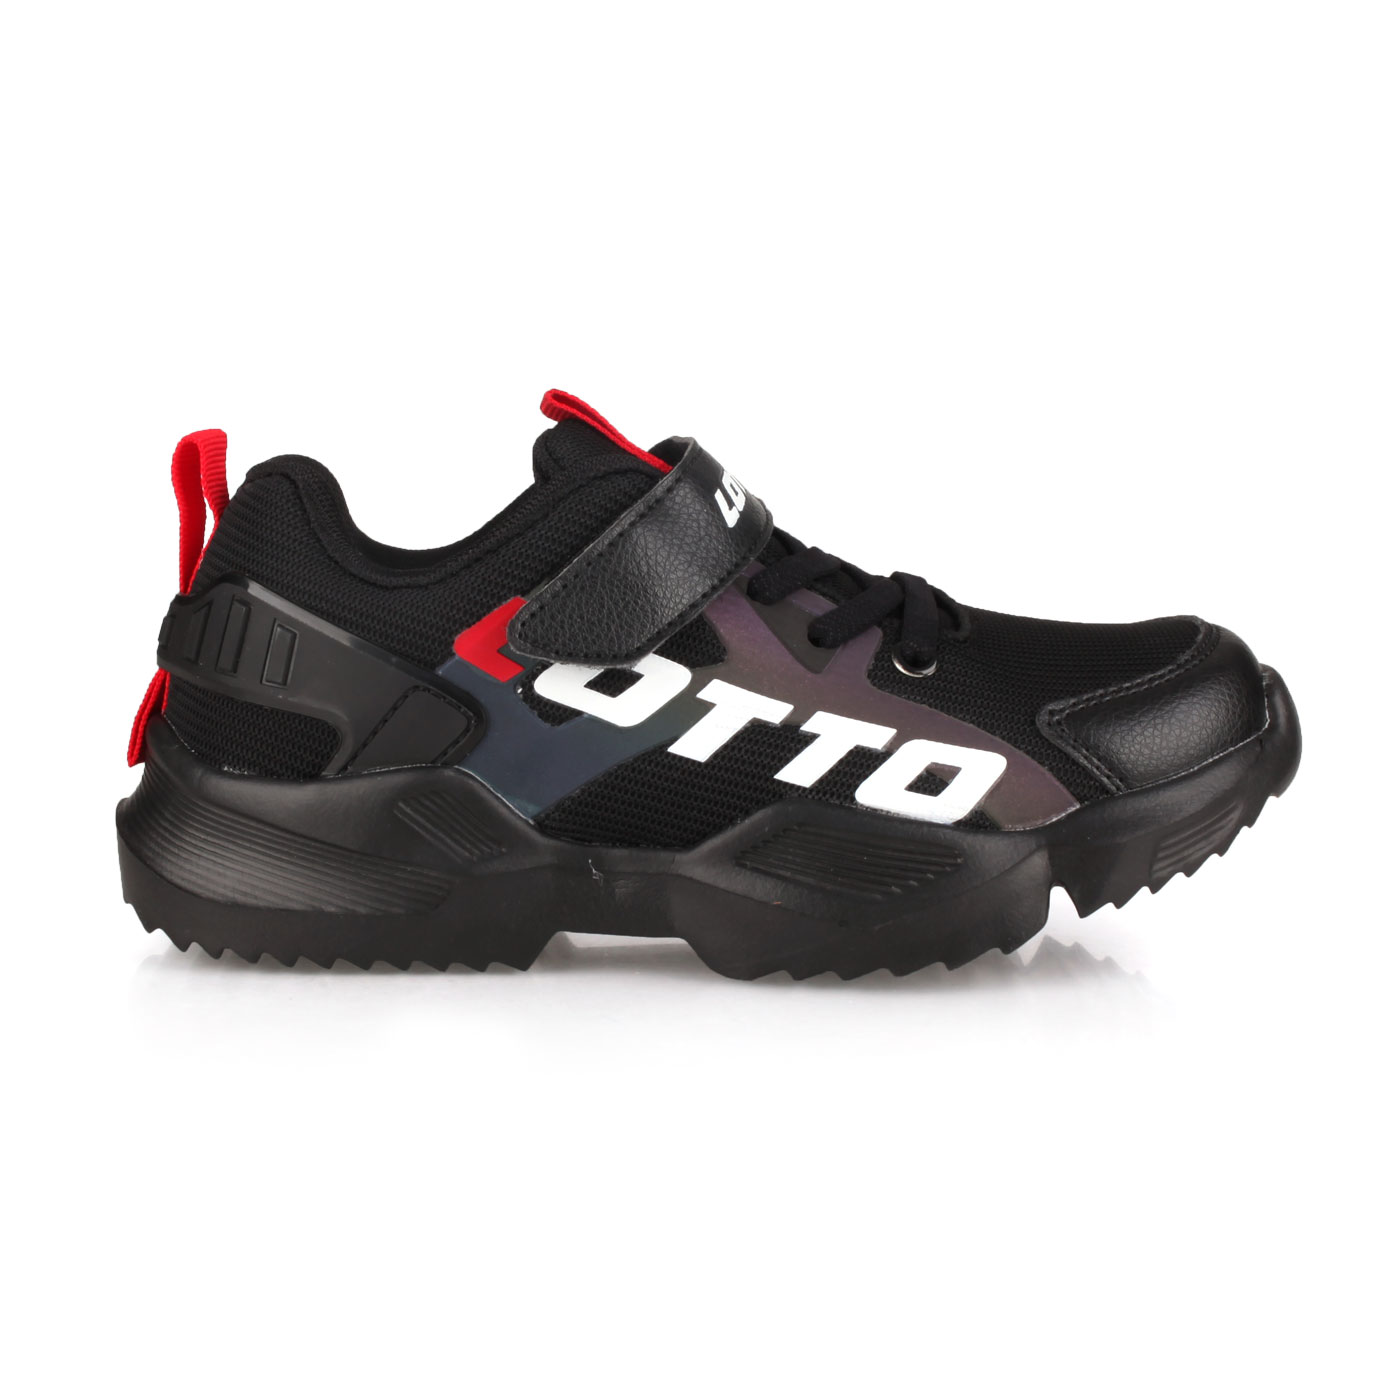 LOTTO 中童輕量跑鞋 LT0AKR1790 - 黑白紅